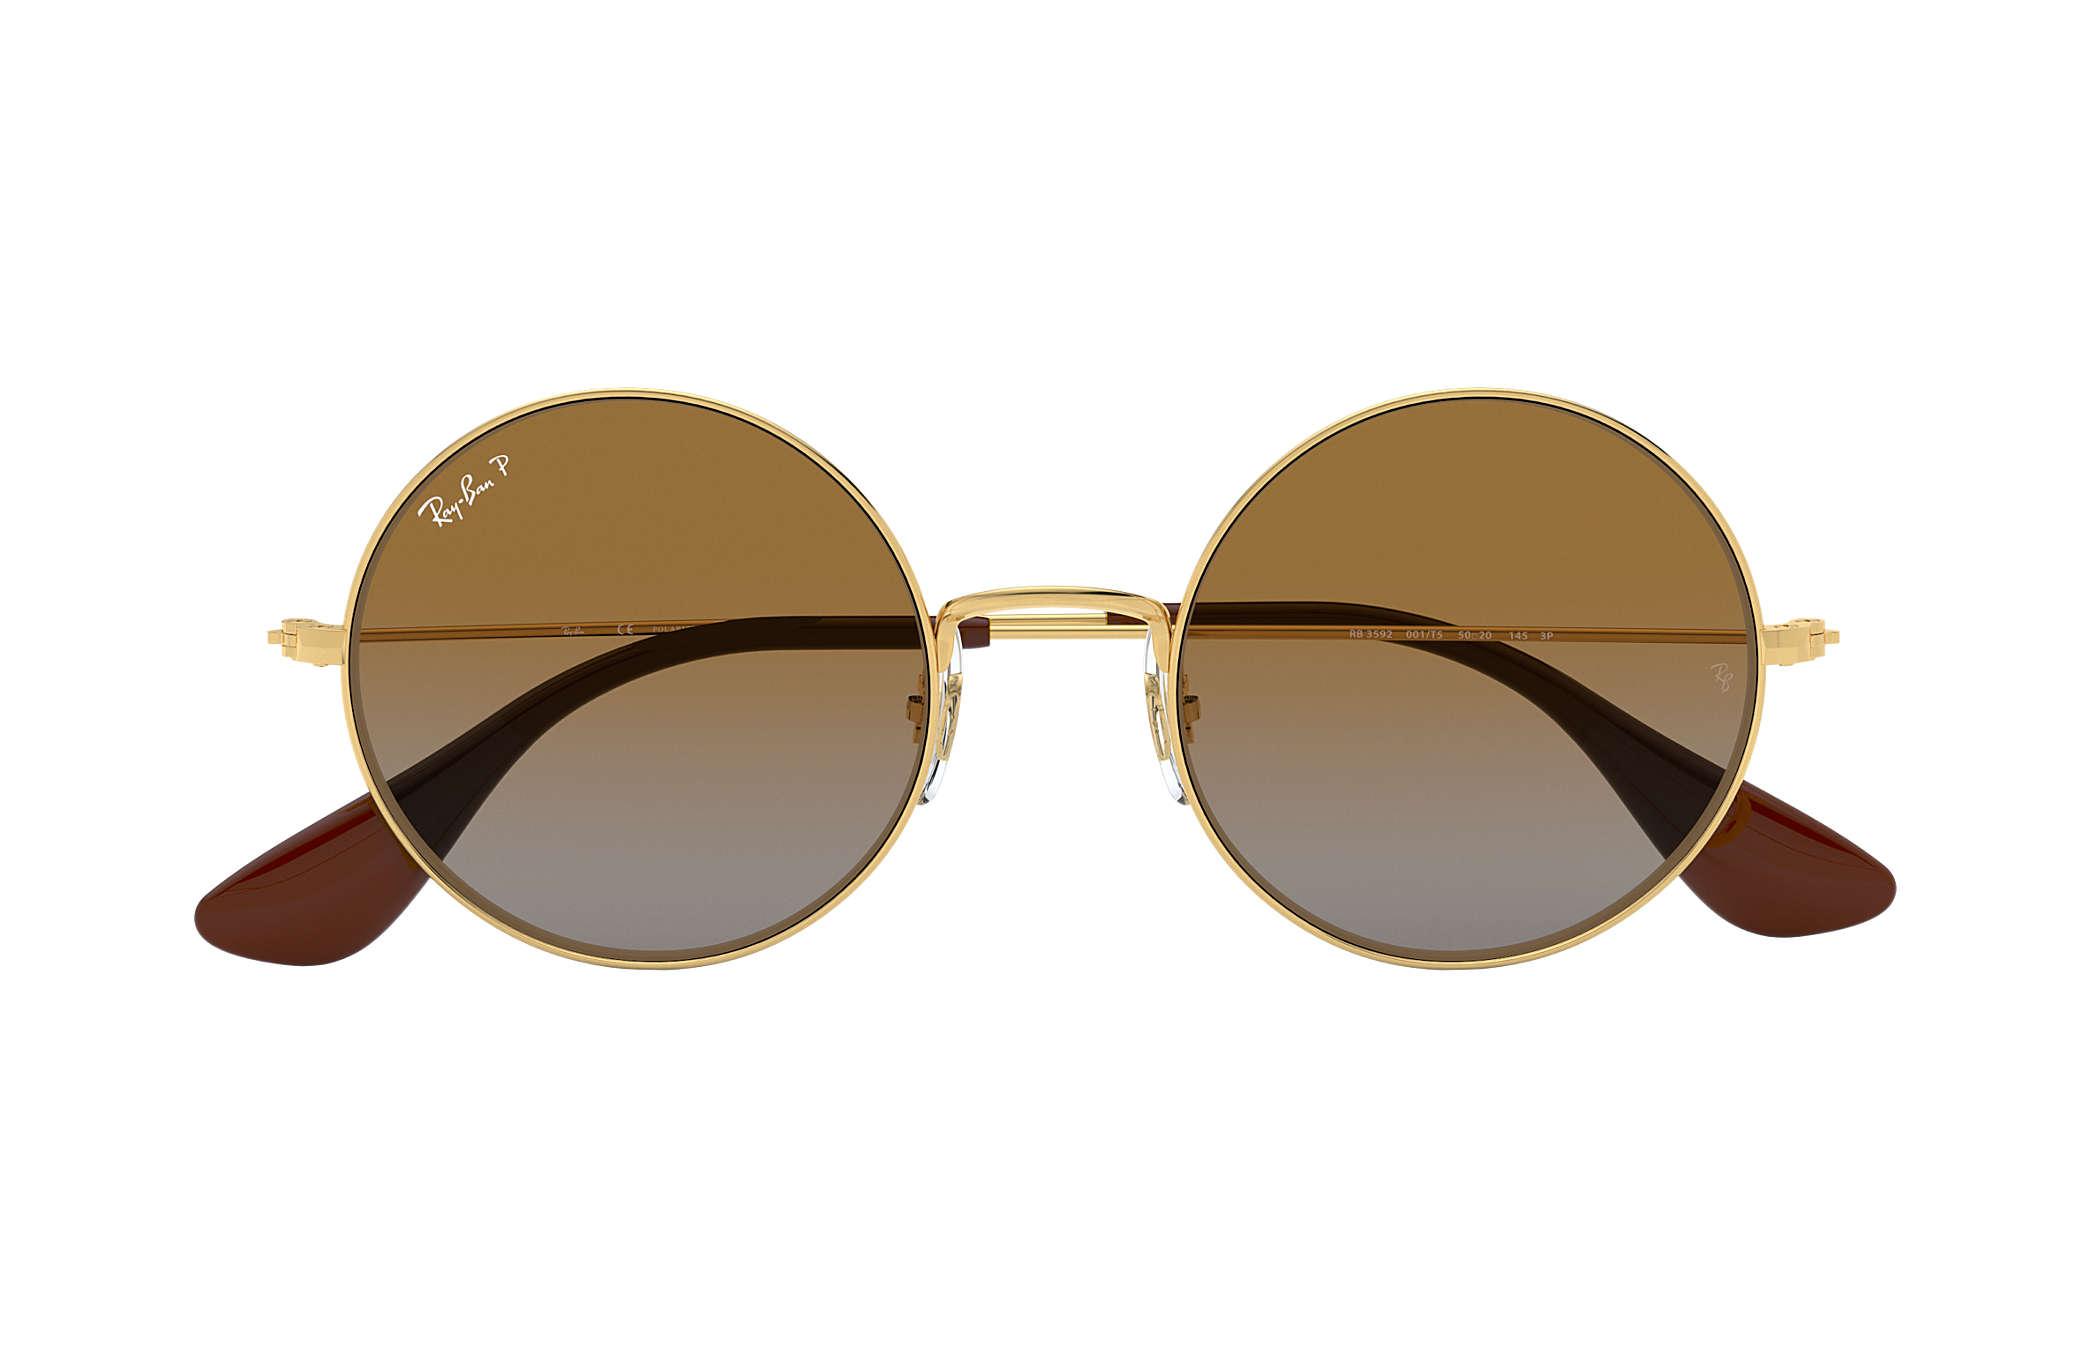 c18510bf48 Ray-Ban Ja-jo RB3592 Gold - Metal - Brown Polarized Lenses ...